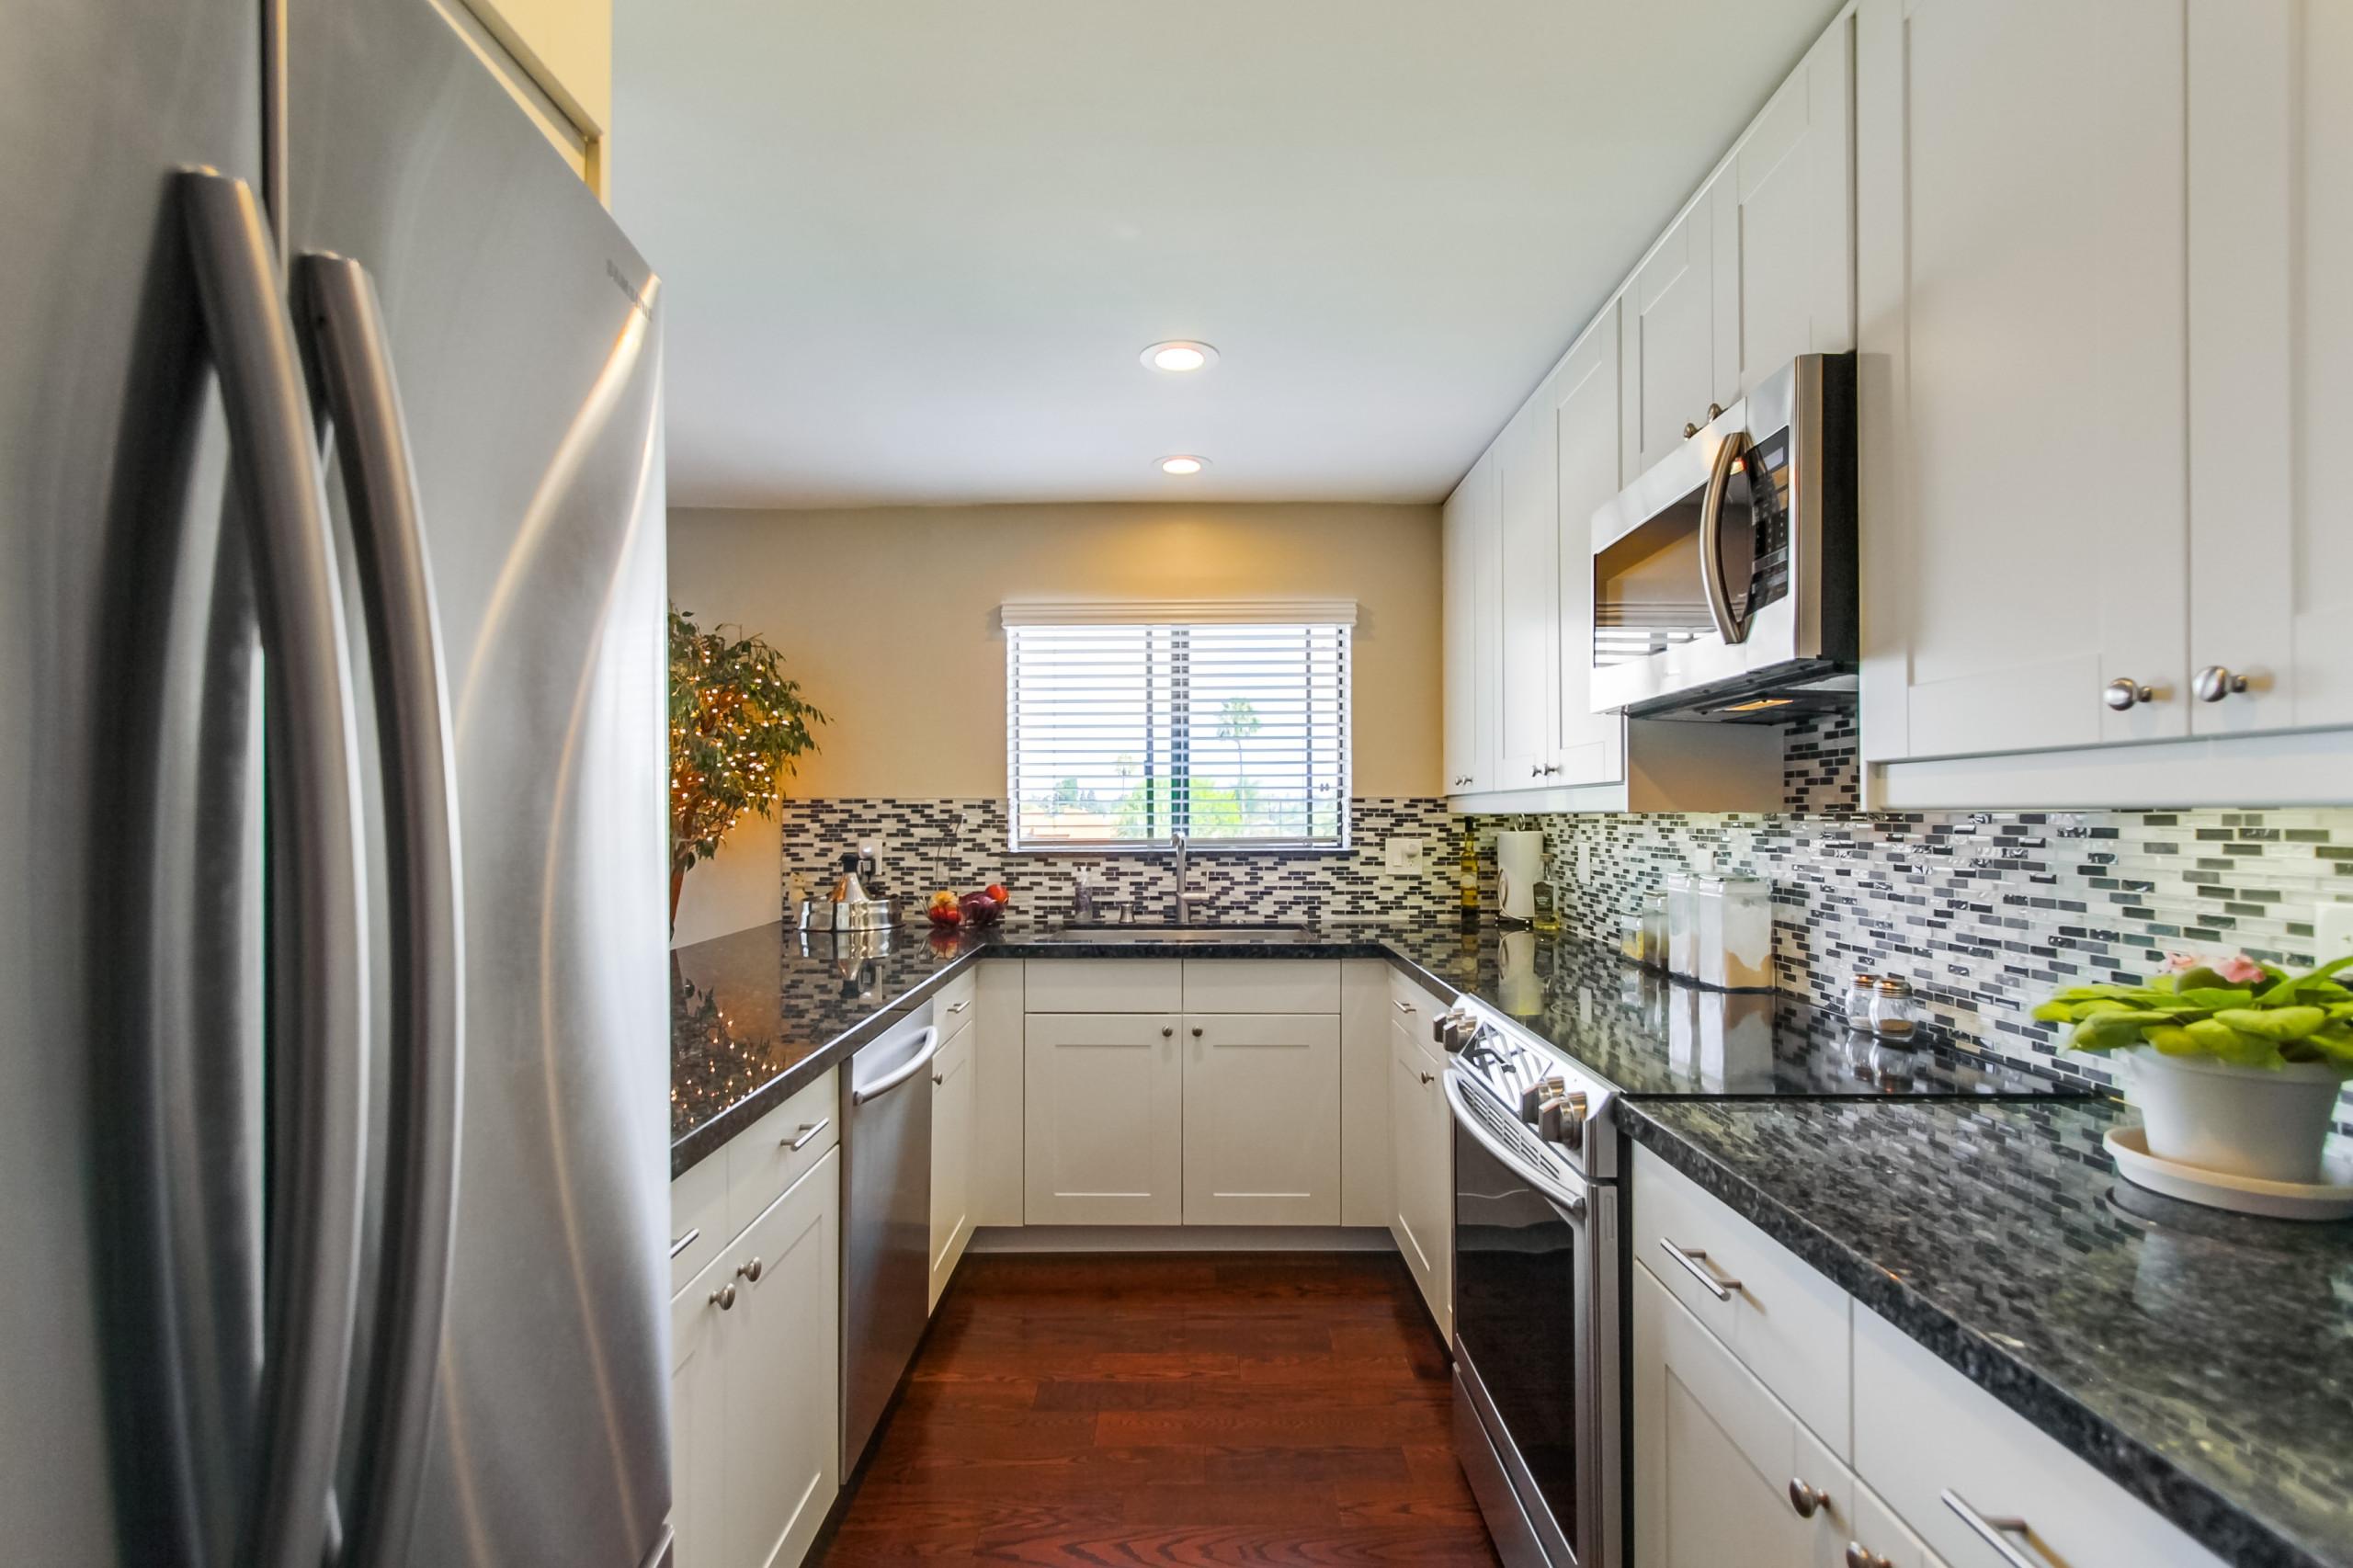 Tikker/Wicen Kitchen Remodel - Centinela